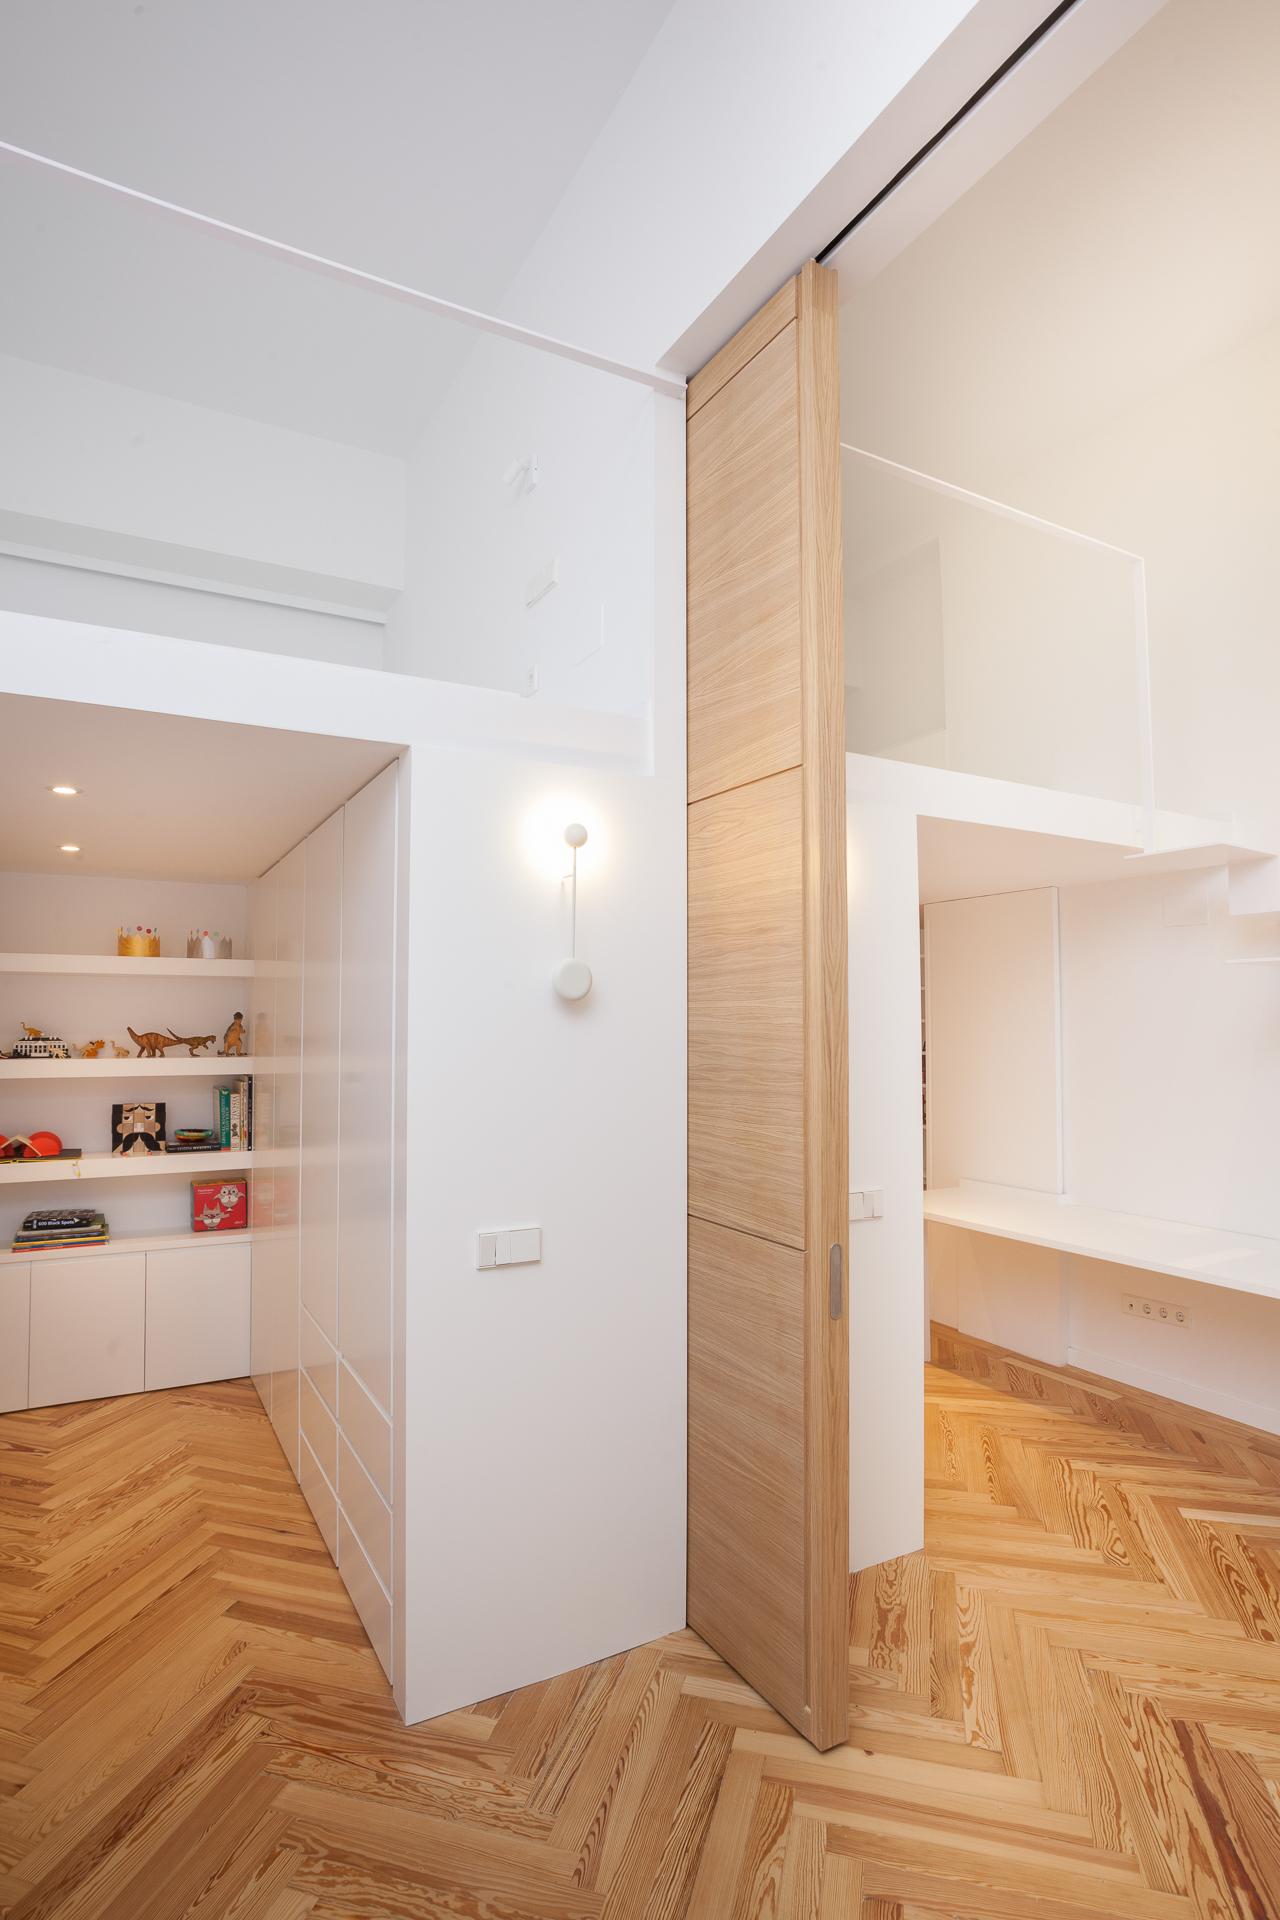 SALESAS_Maroto_Ibañez_arquitectos12